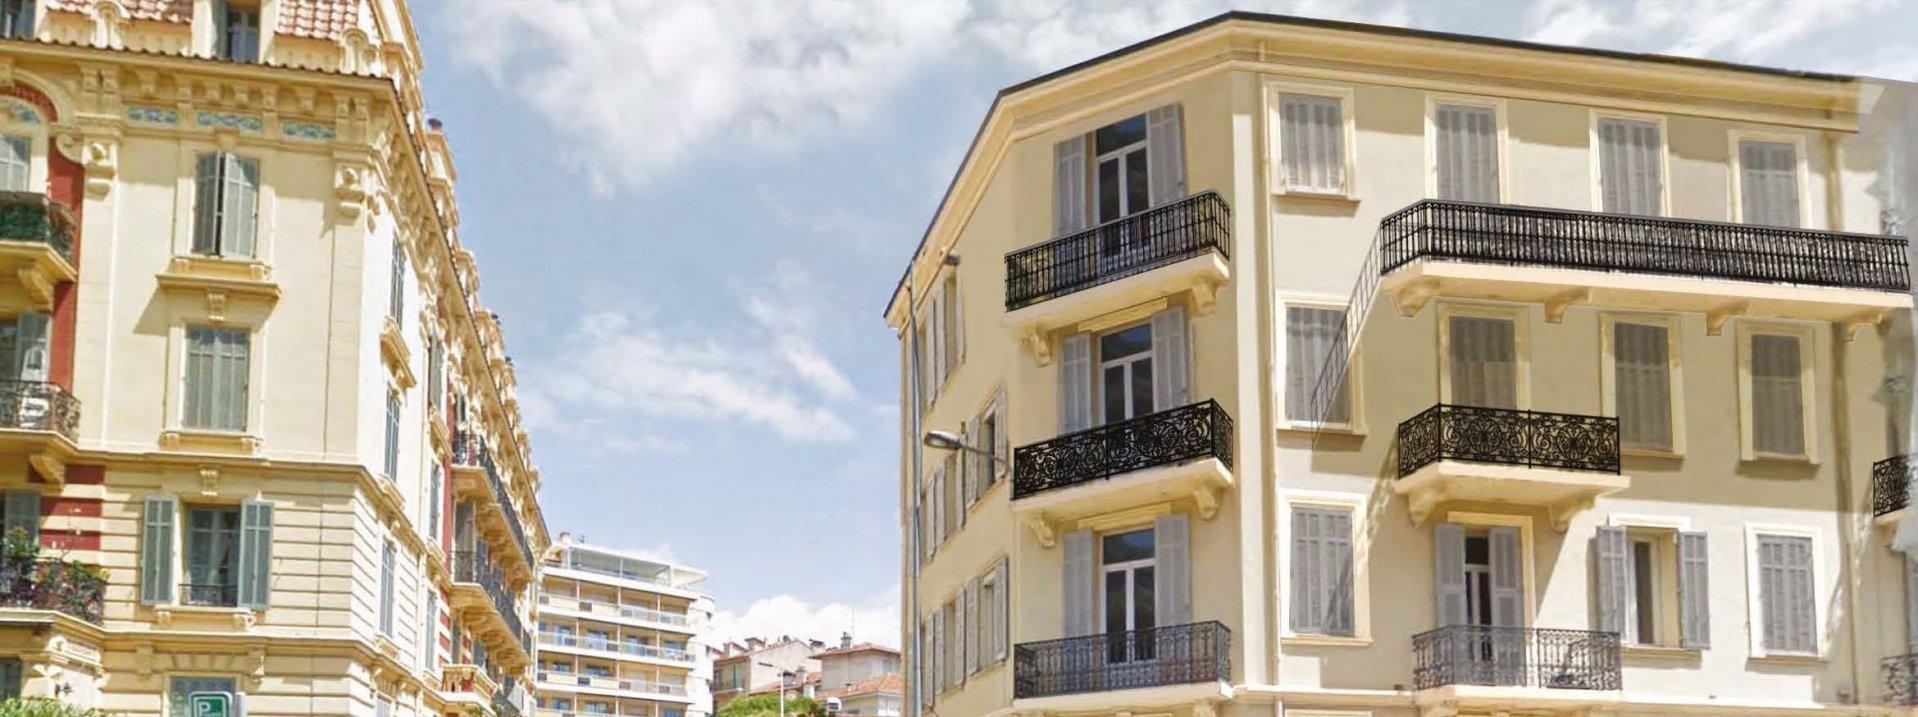 Cannes Centre T2 Investissement